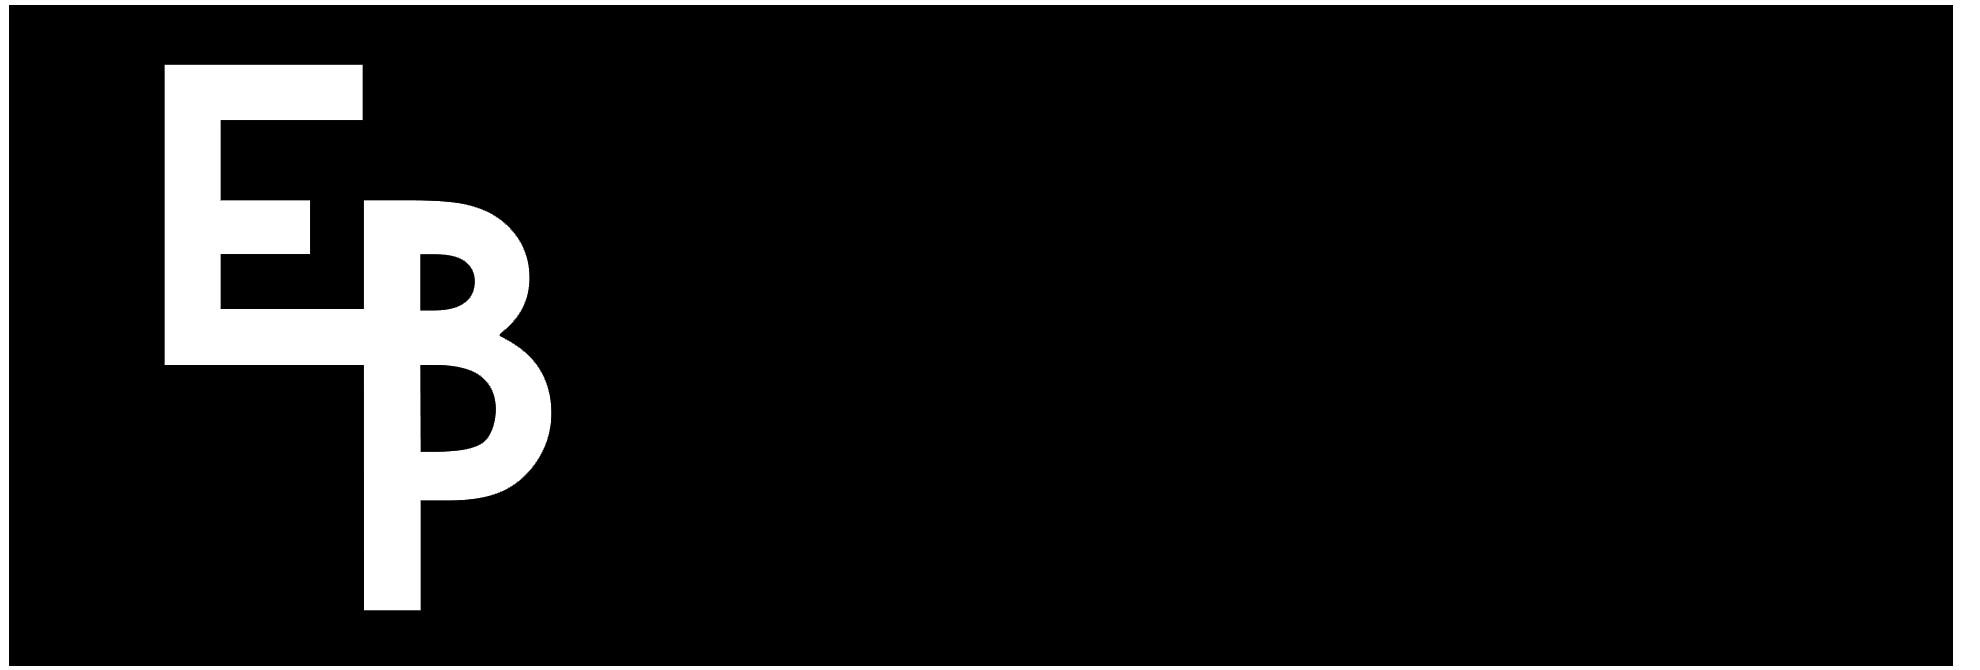 b81336_03f0cbc808d64766a1fb93b2675c2bff~mv2.png